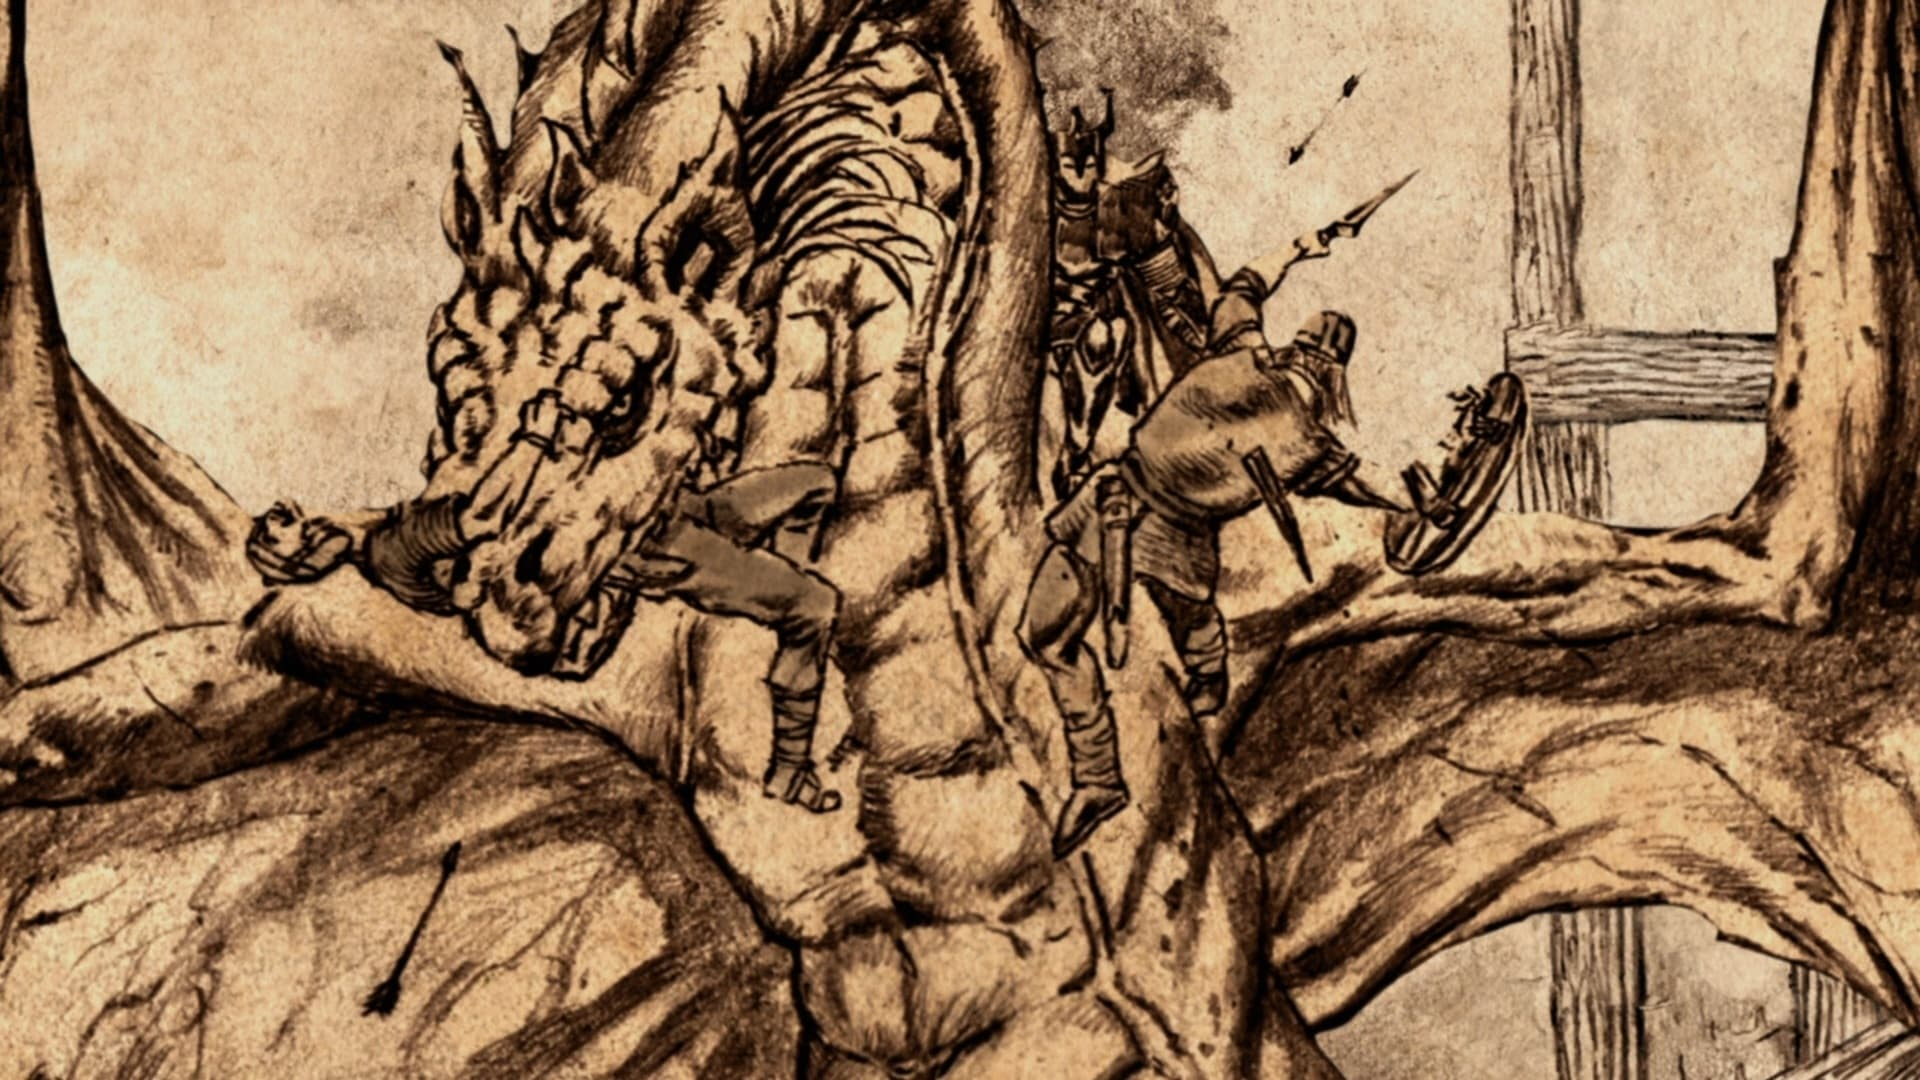 Game of Thrones Season 0 :Episode 64  Histories & Lore: The Field of Fire (Viserys Targaryen)